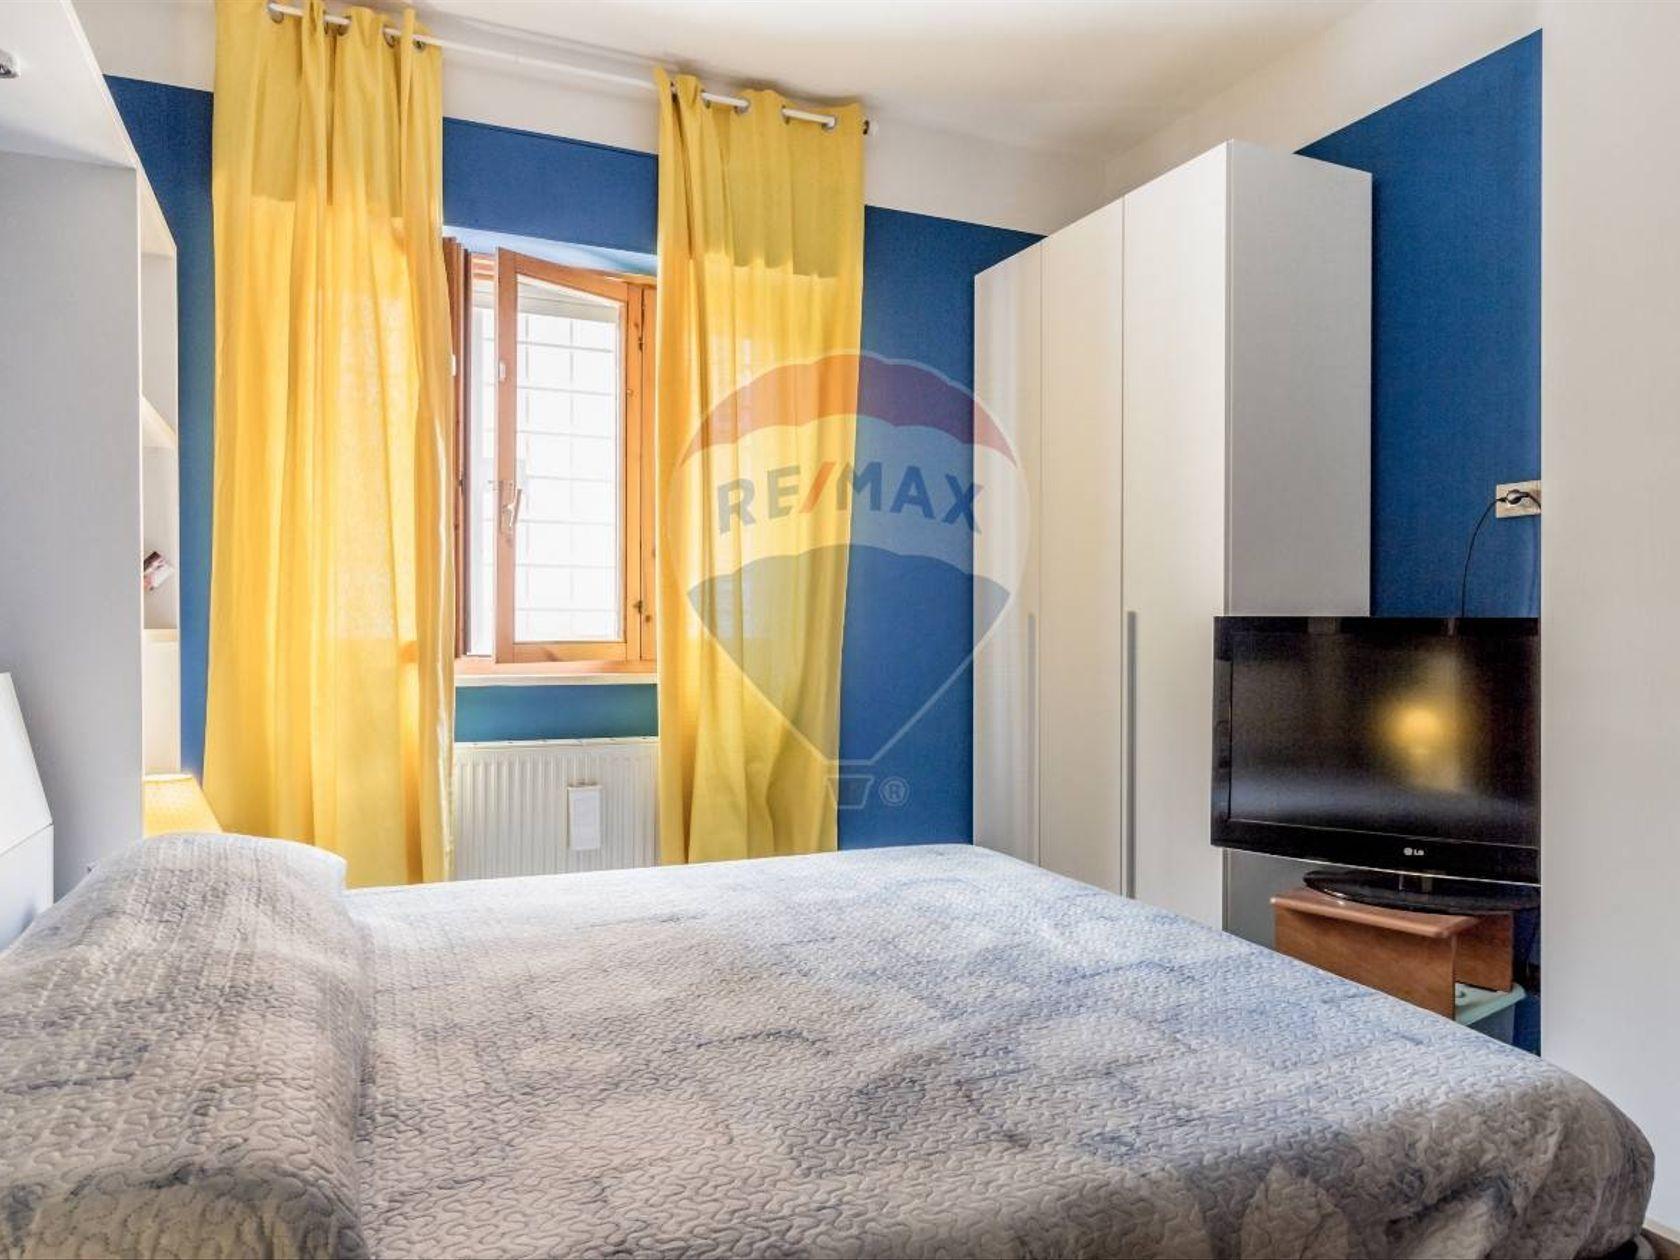 Appartamento Villa Adriana, Tivoli, RM Vendita - Foto 14